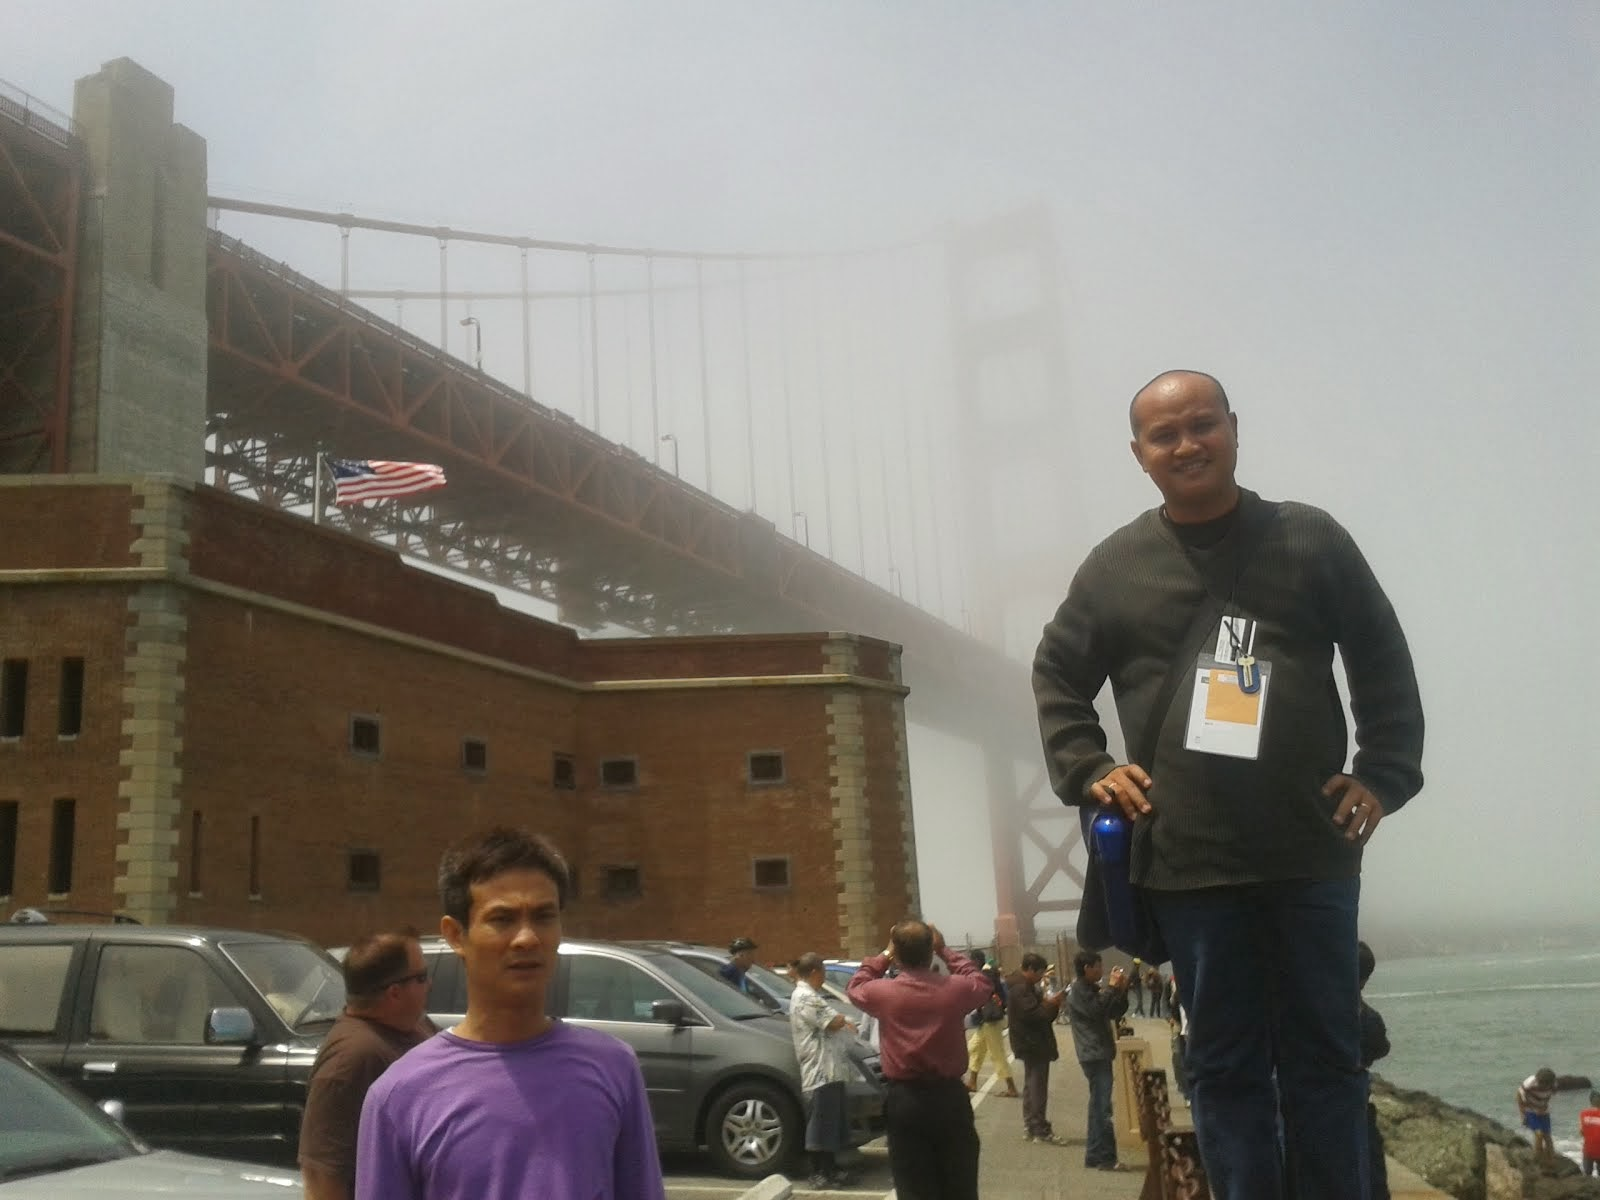 Golden Gate, California 2012